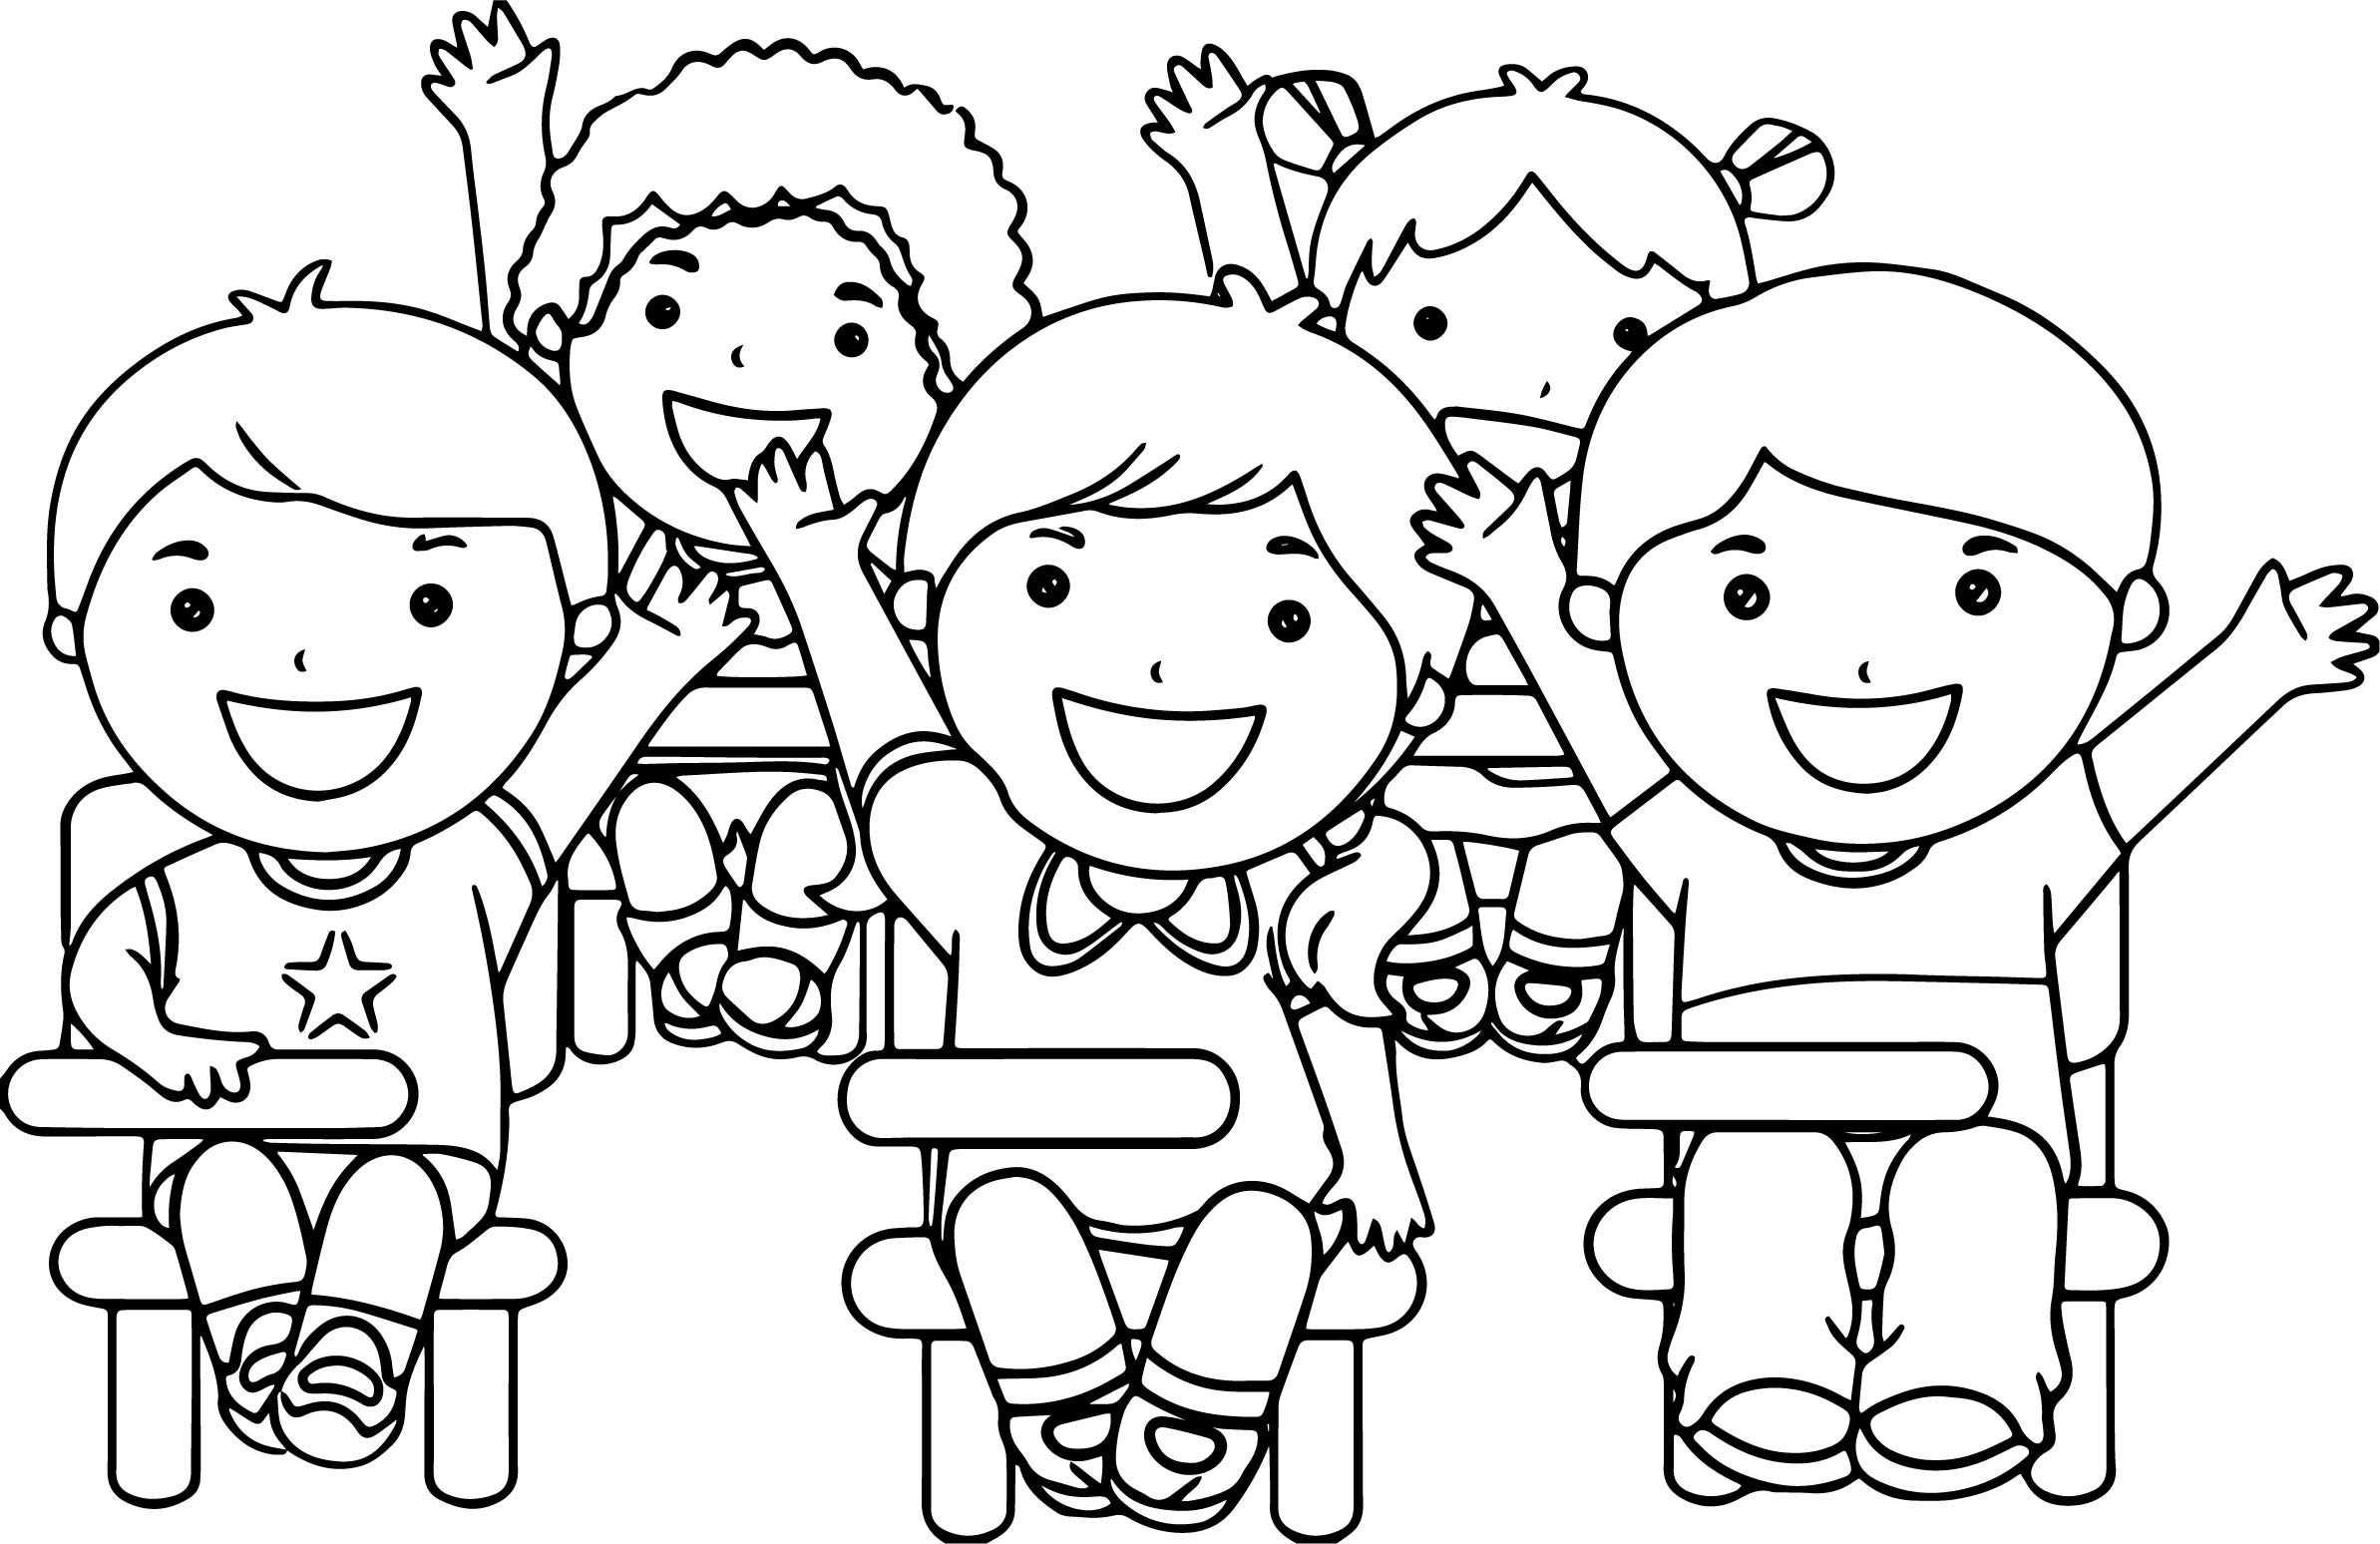 2386x1548 Child Coloring Pages Child Coloring Pages At The School Children